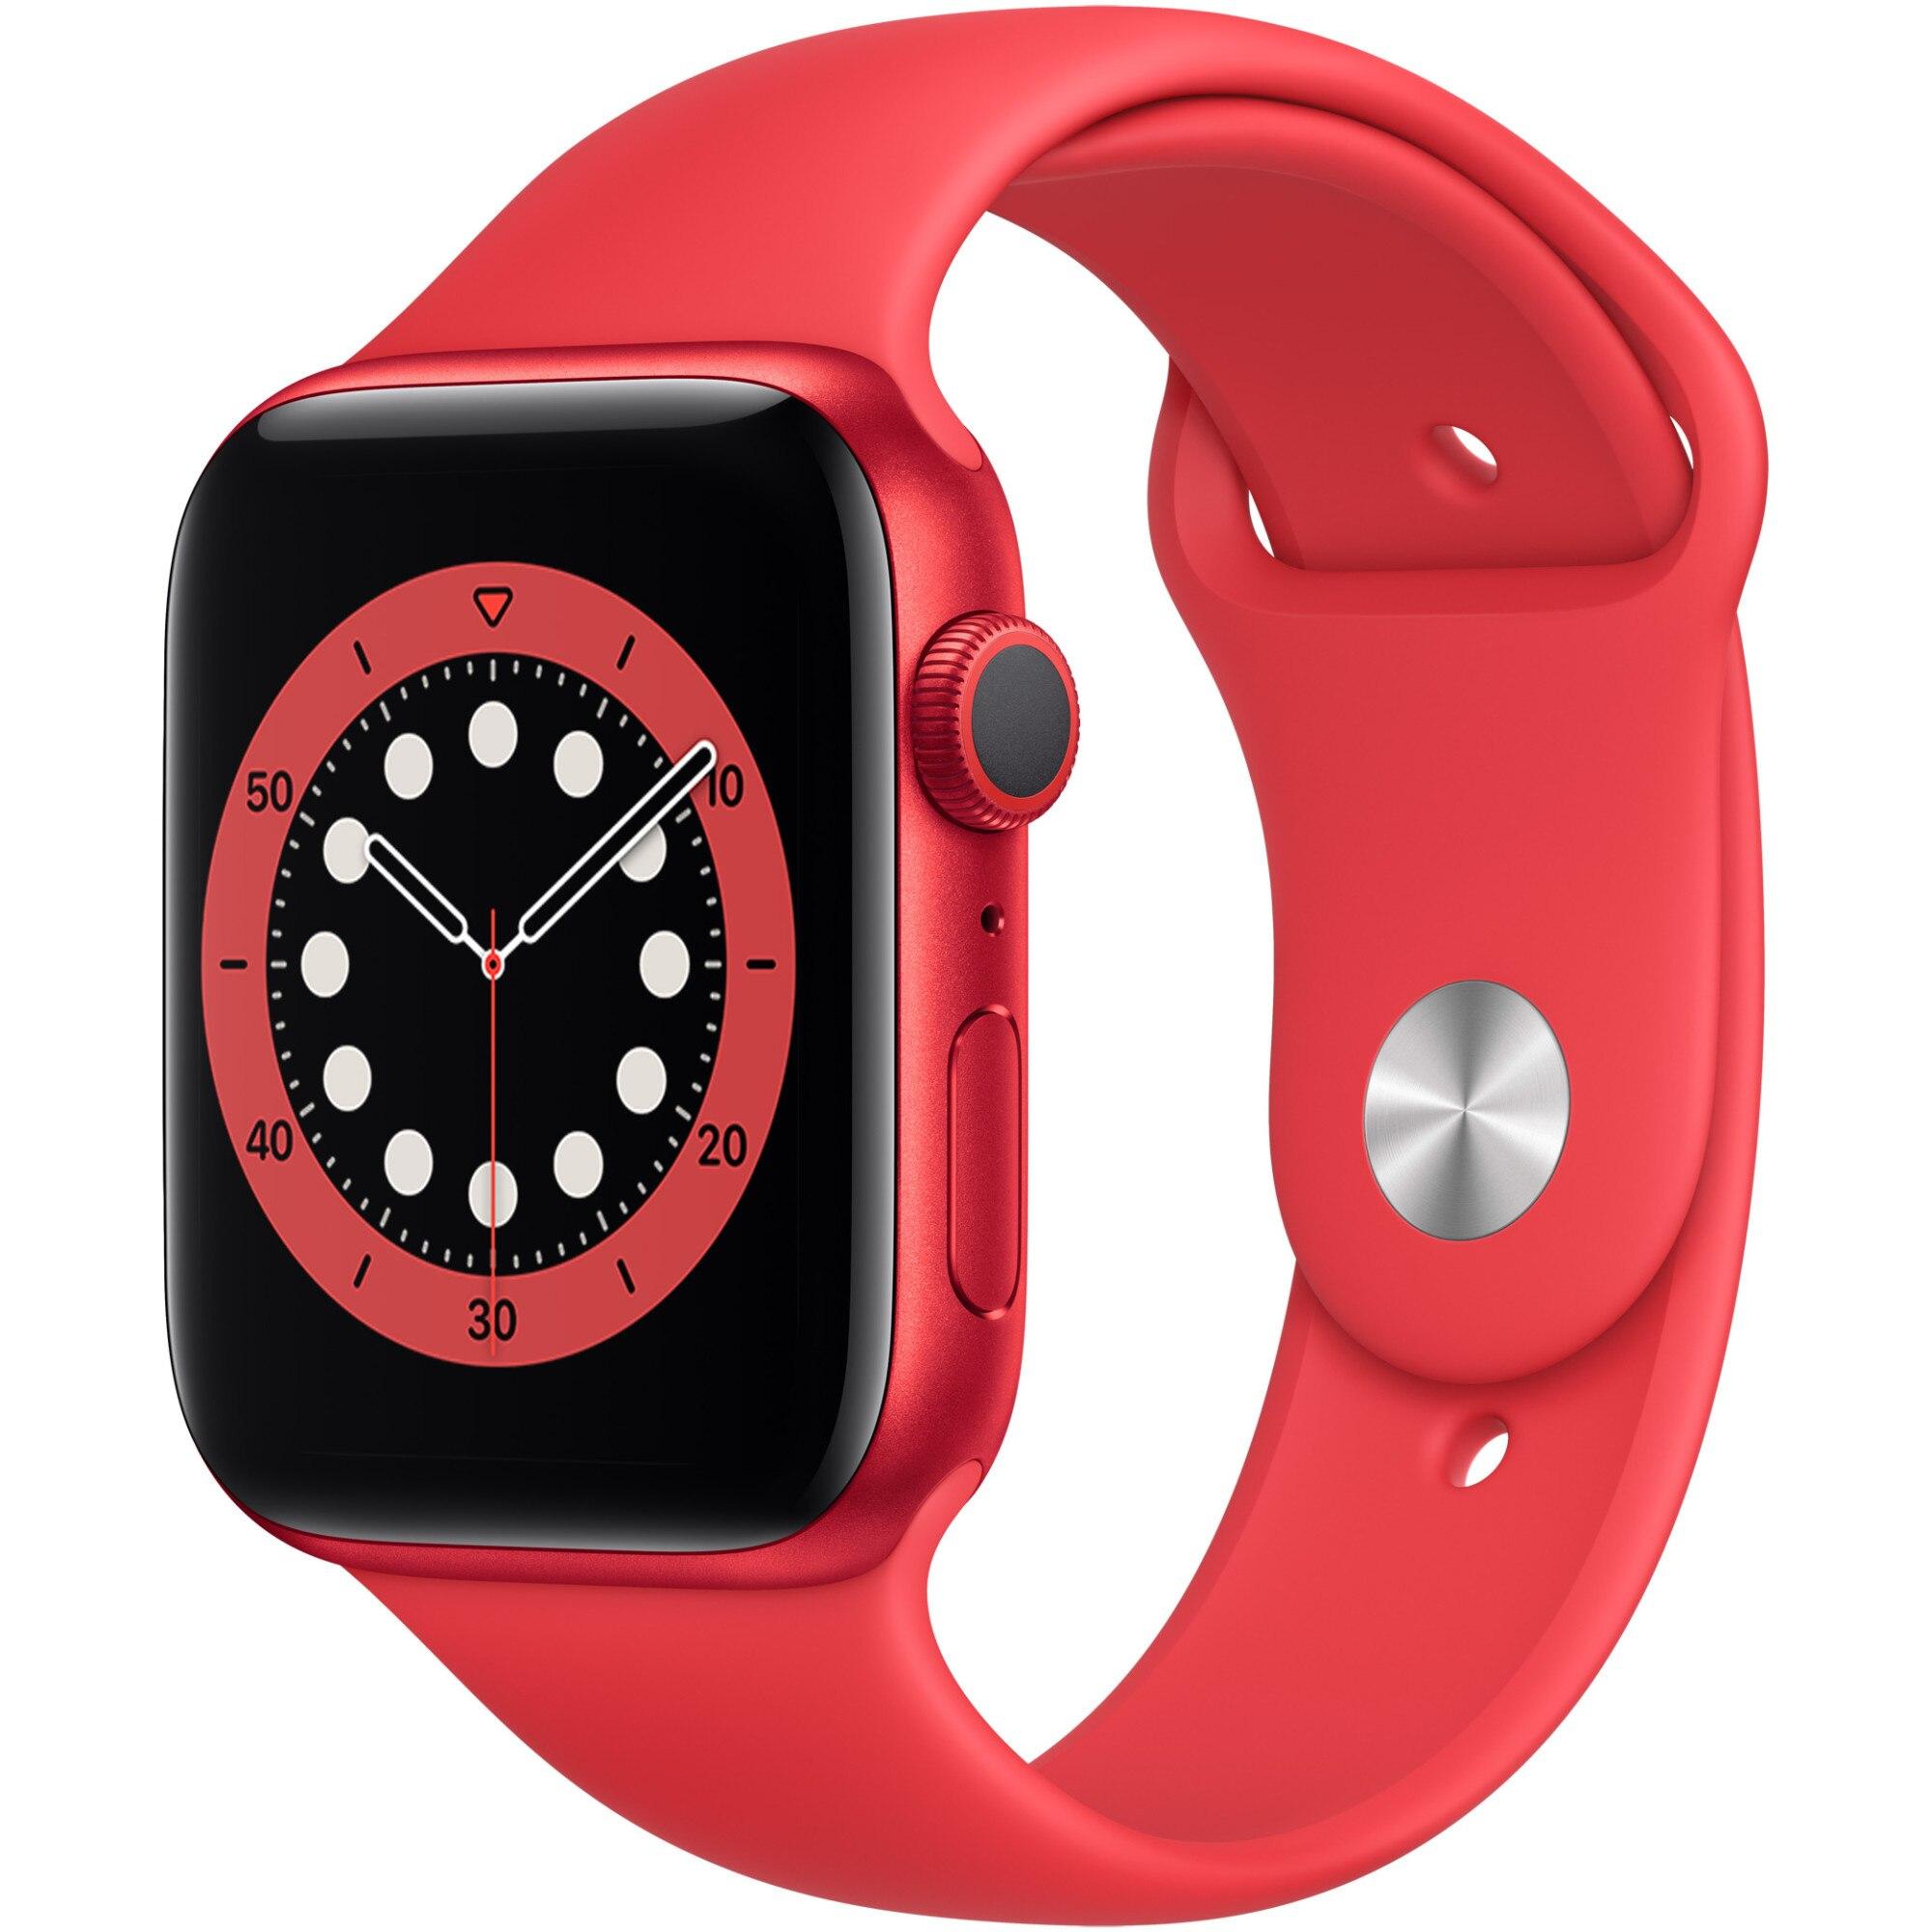 Fotografie Apple Watch 6, GPS, Carcasa Red Aluminium 44mm, Red Sport Band